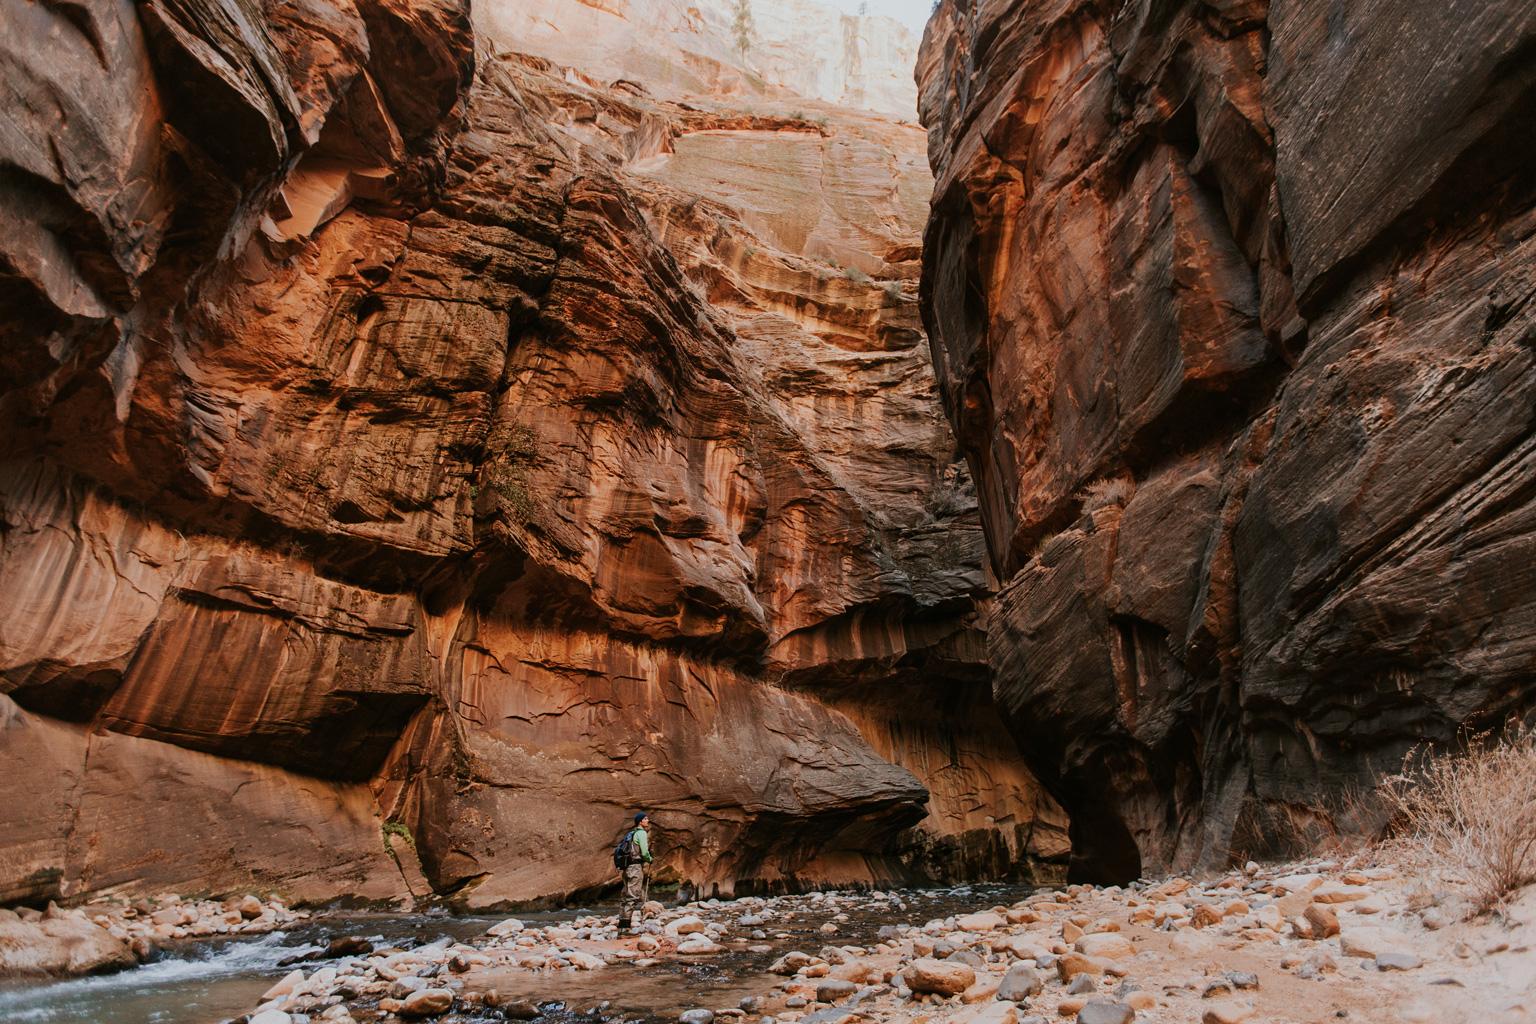 CindyGiovagnoli_Zion_National_Park_Utah_Narrows_hike_winter-001.jpg